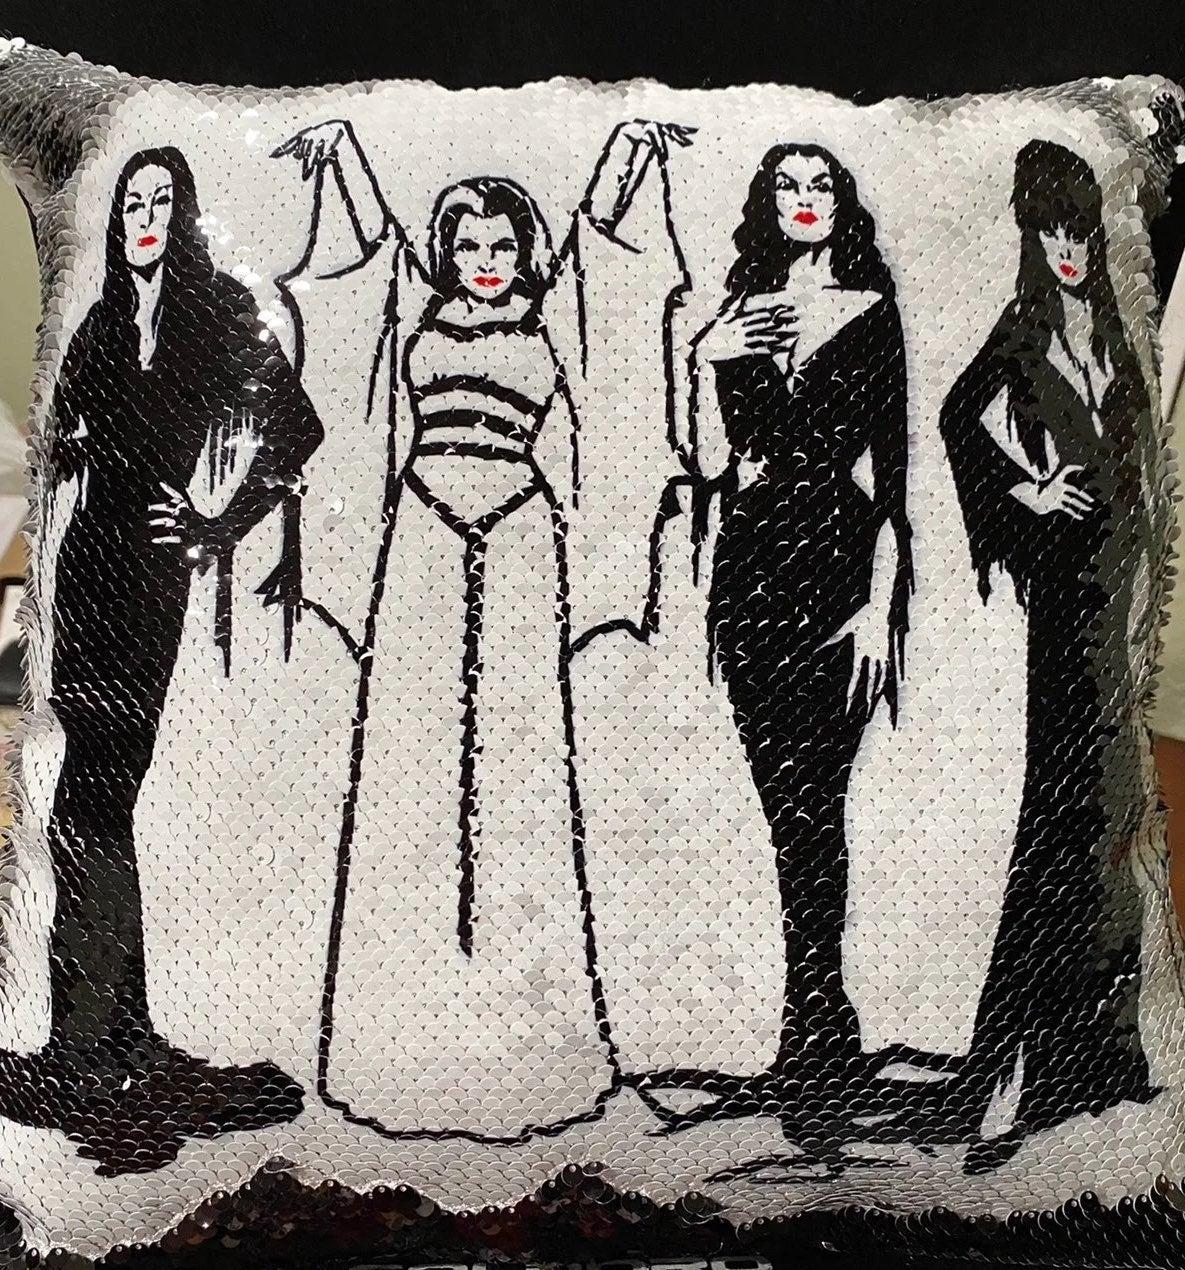 Custom pressed Ghouls sequin pillow case